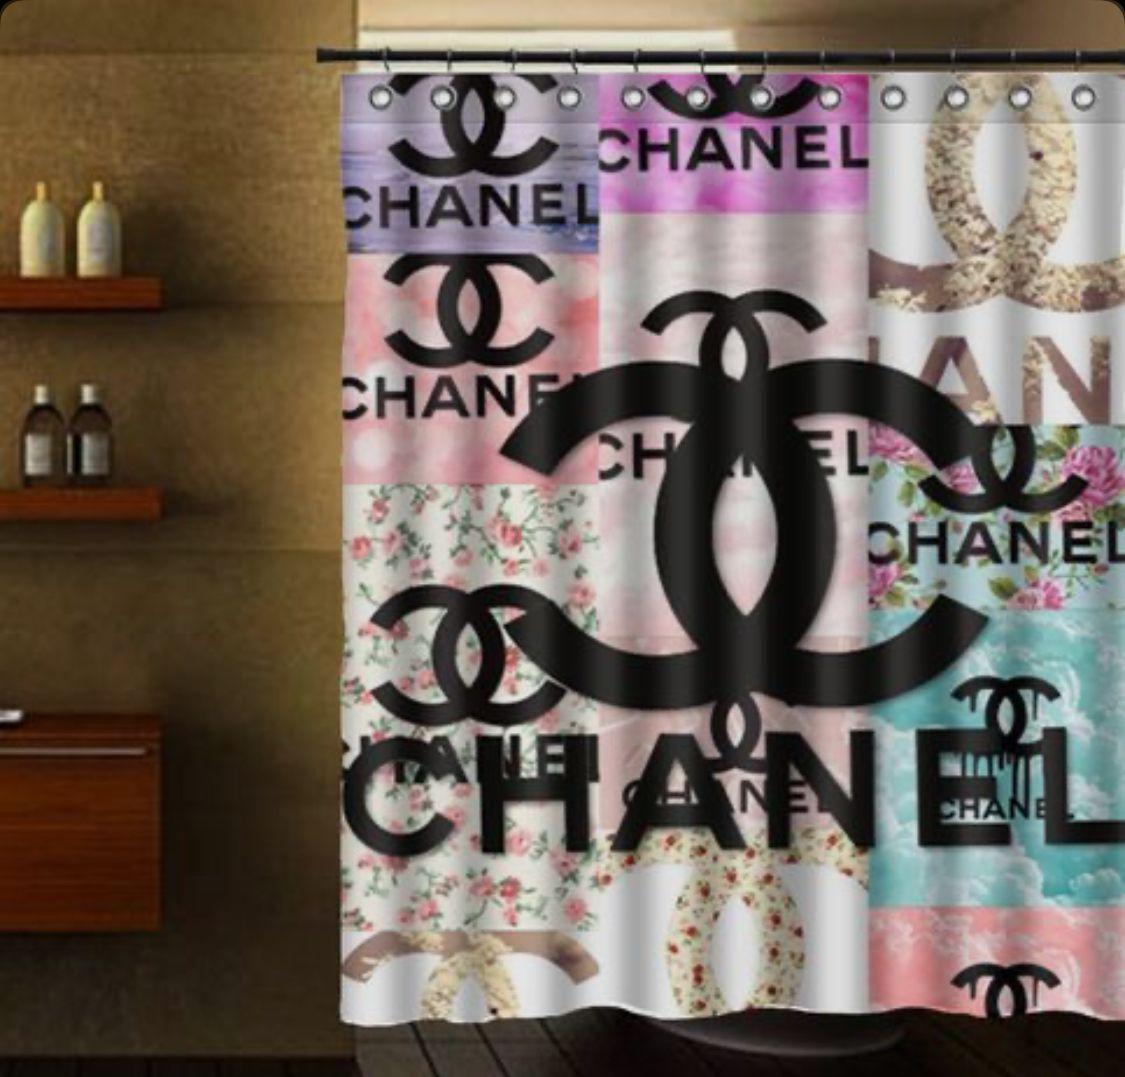 Pin By Latoya Smith On Ladies Room In 2020 Chanel Room Custom